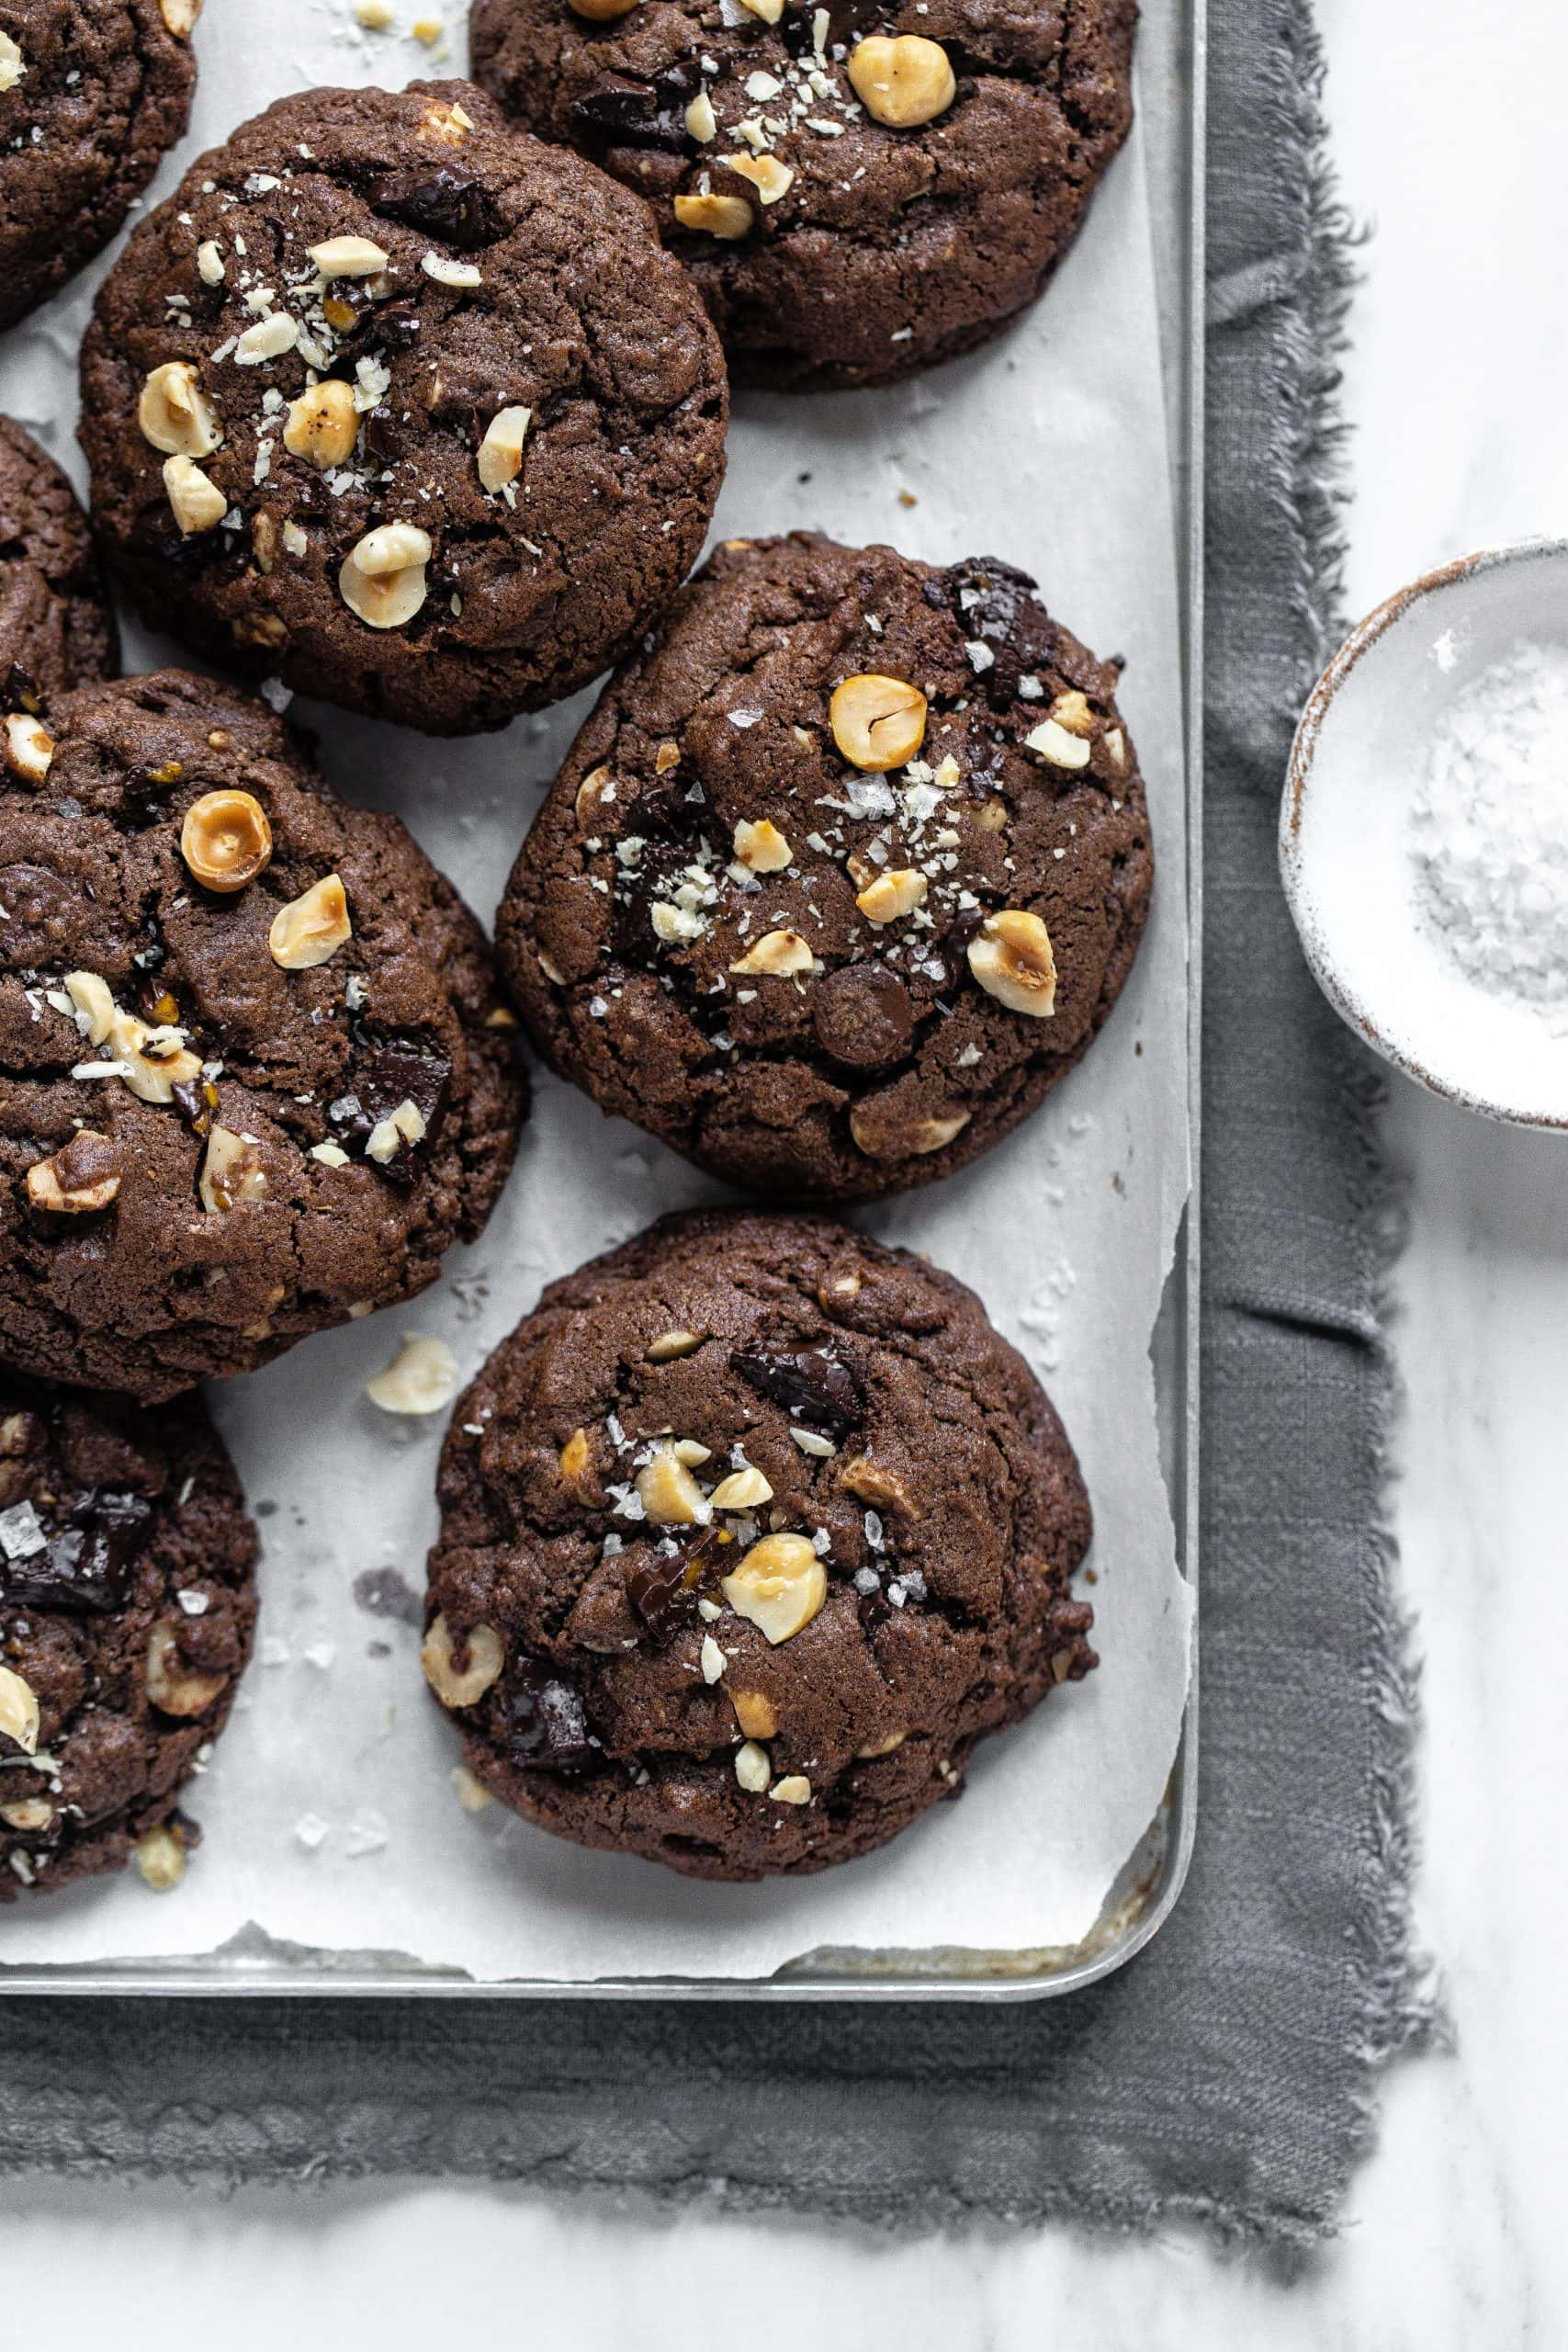 double chocolate hazelnut cookies on tray